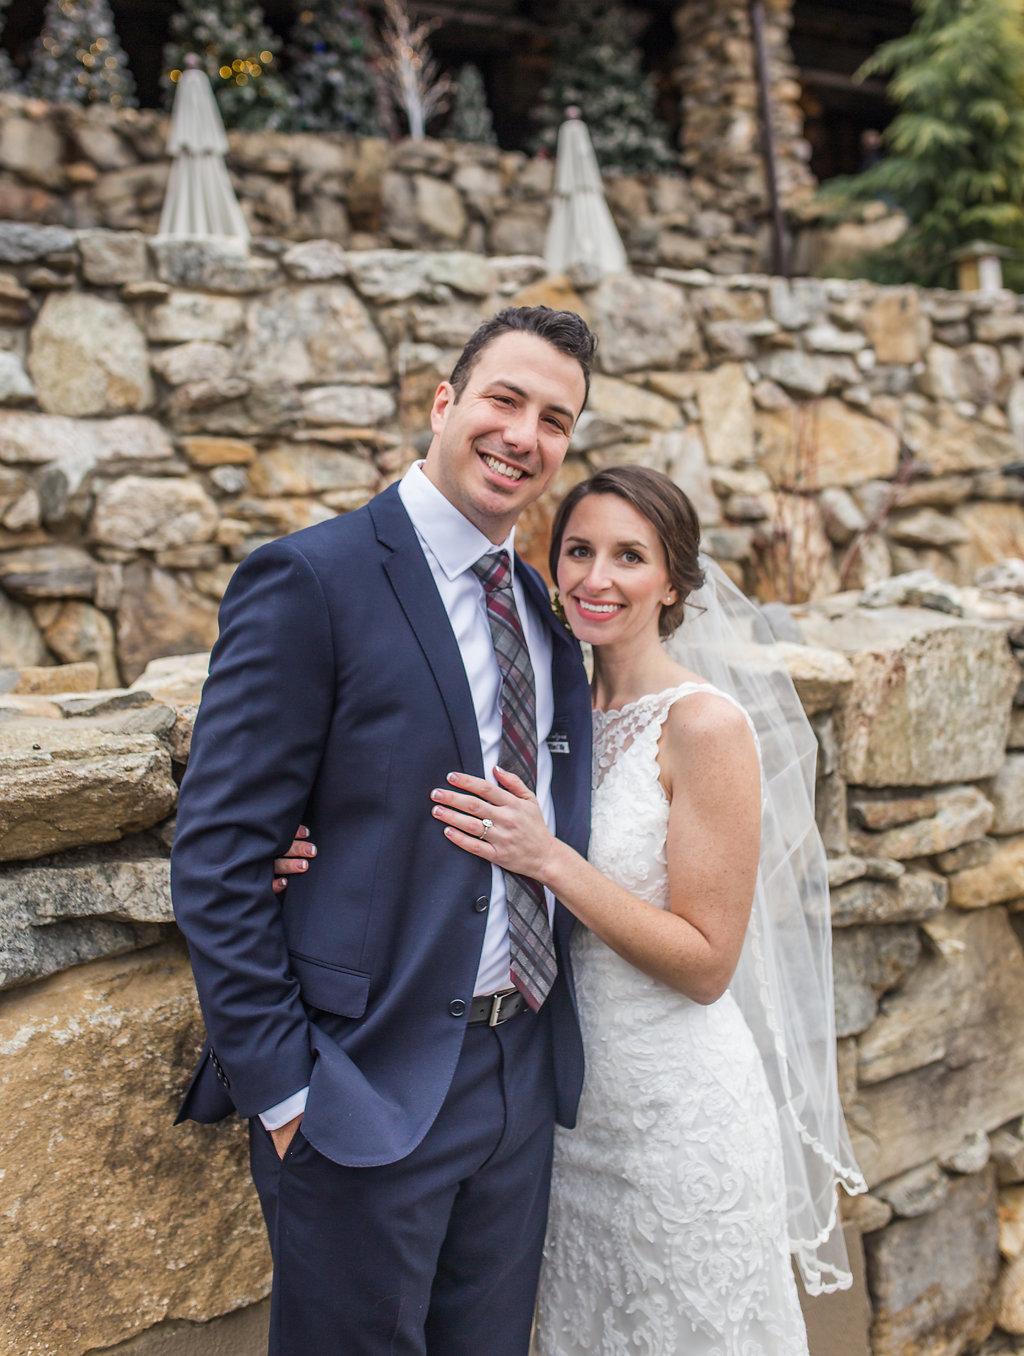 Honeysuckle-Hill-Asheville-Wedding-Venue-Chase-Chris-Elopement-94.JPG